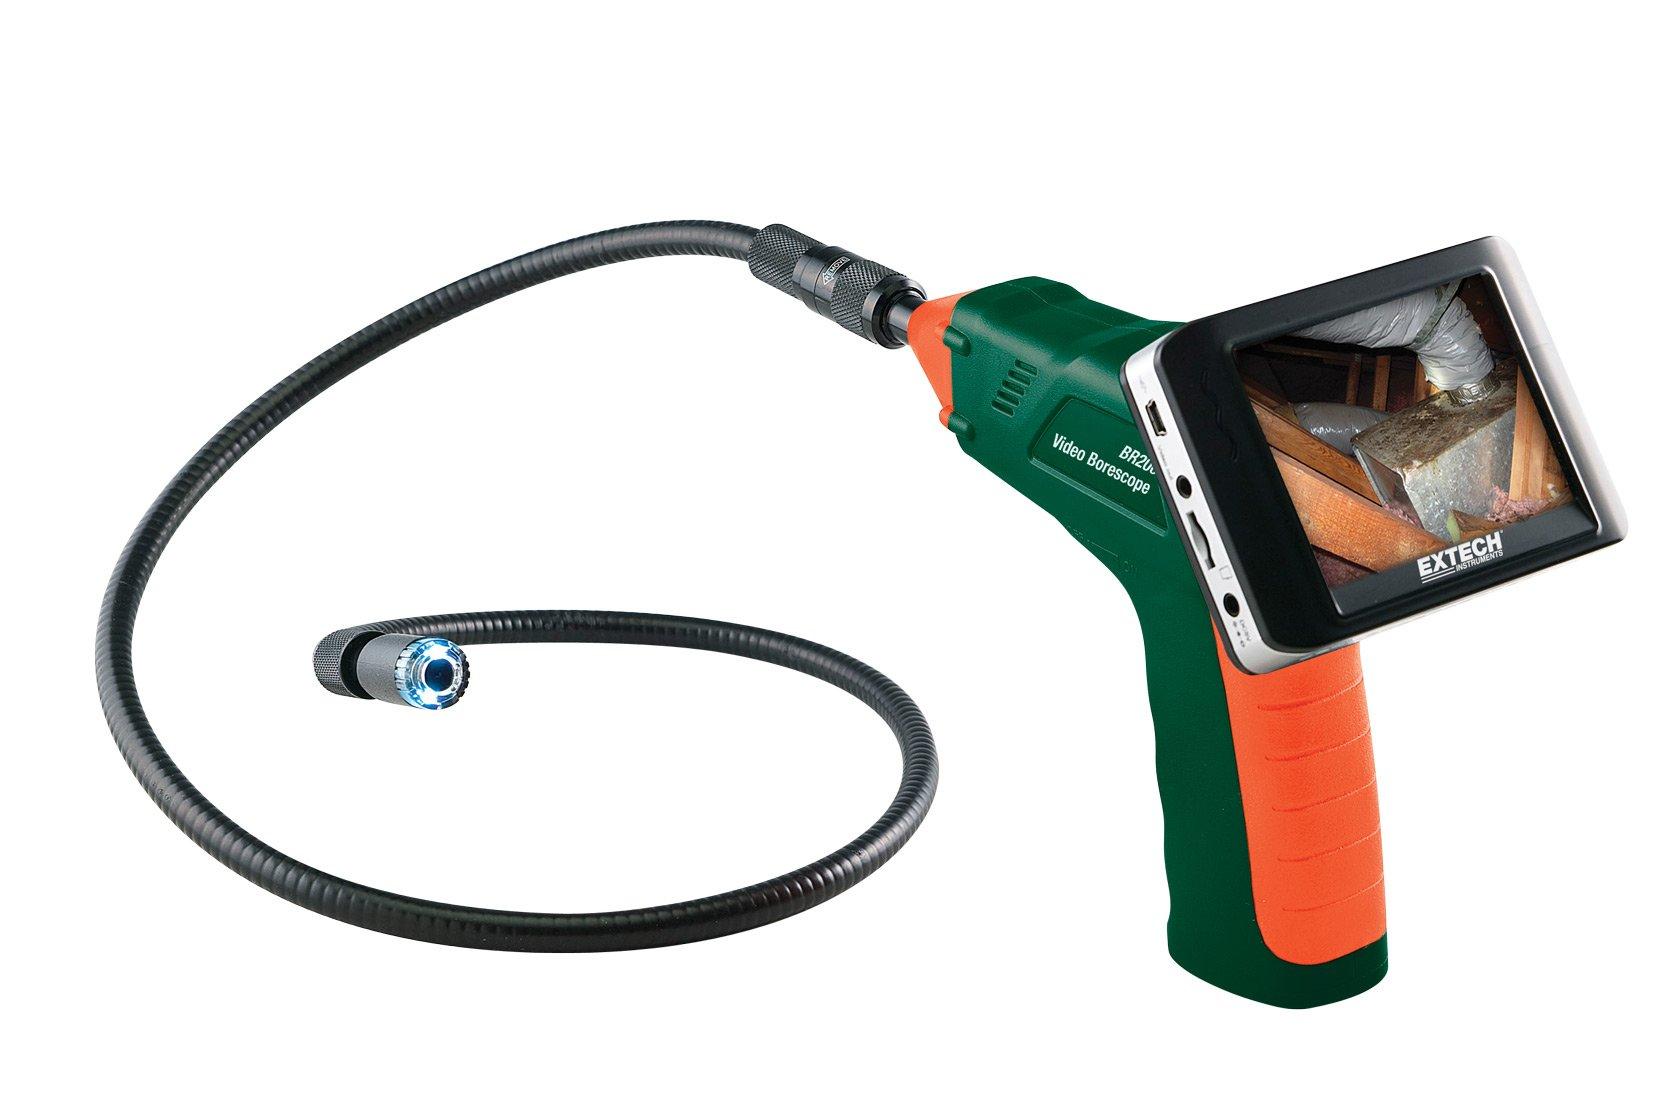 Extech BR200 Video Borescope/Wireless Inspection Camera